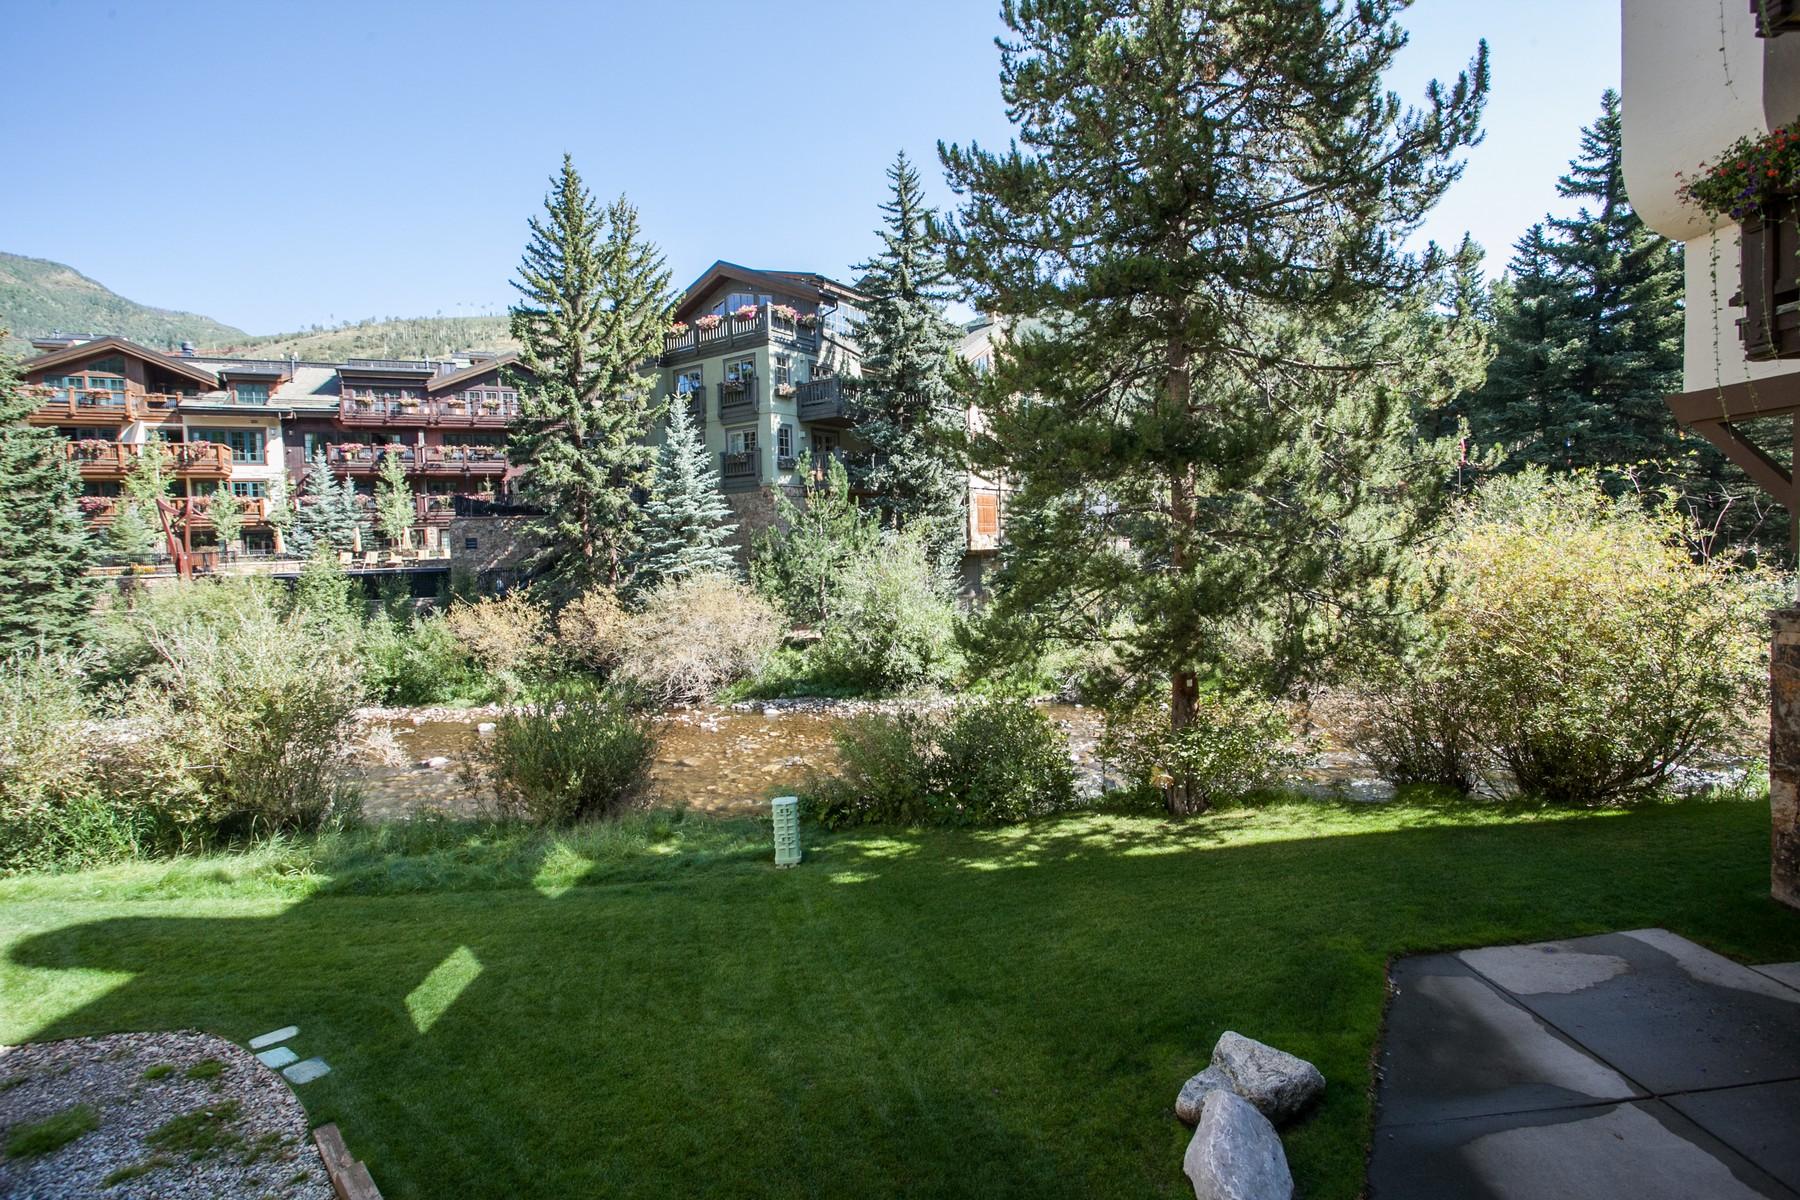 Condomínio para Venda às Riverhouse #1 83 Willow Pl 1 Vail, Colorado 81657 Estados Unidos